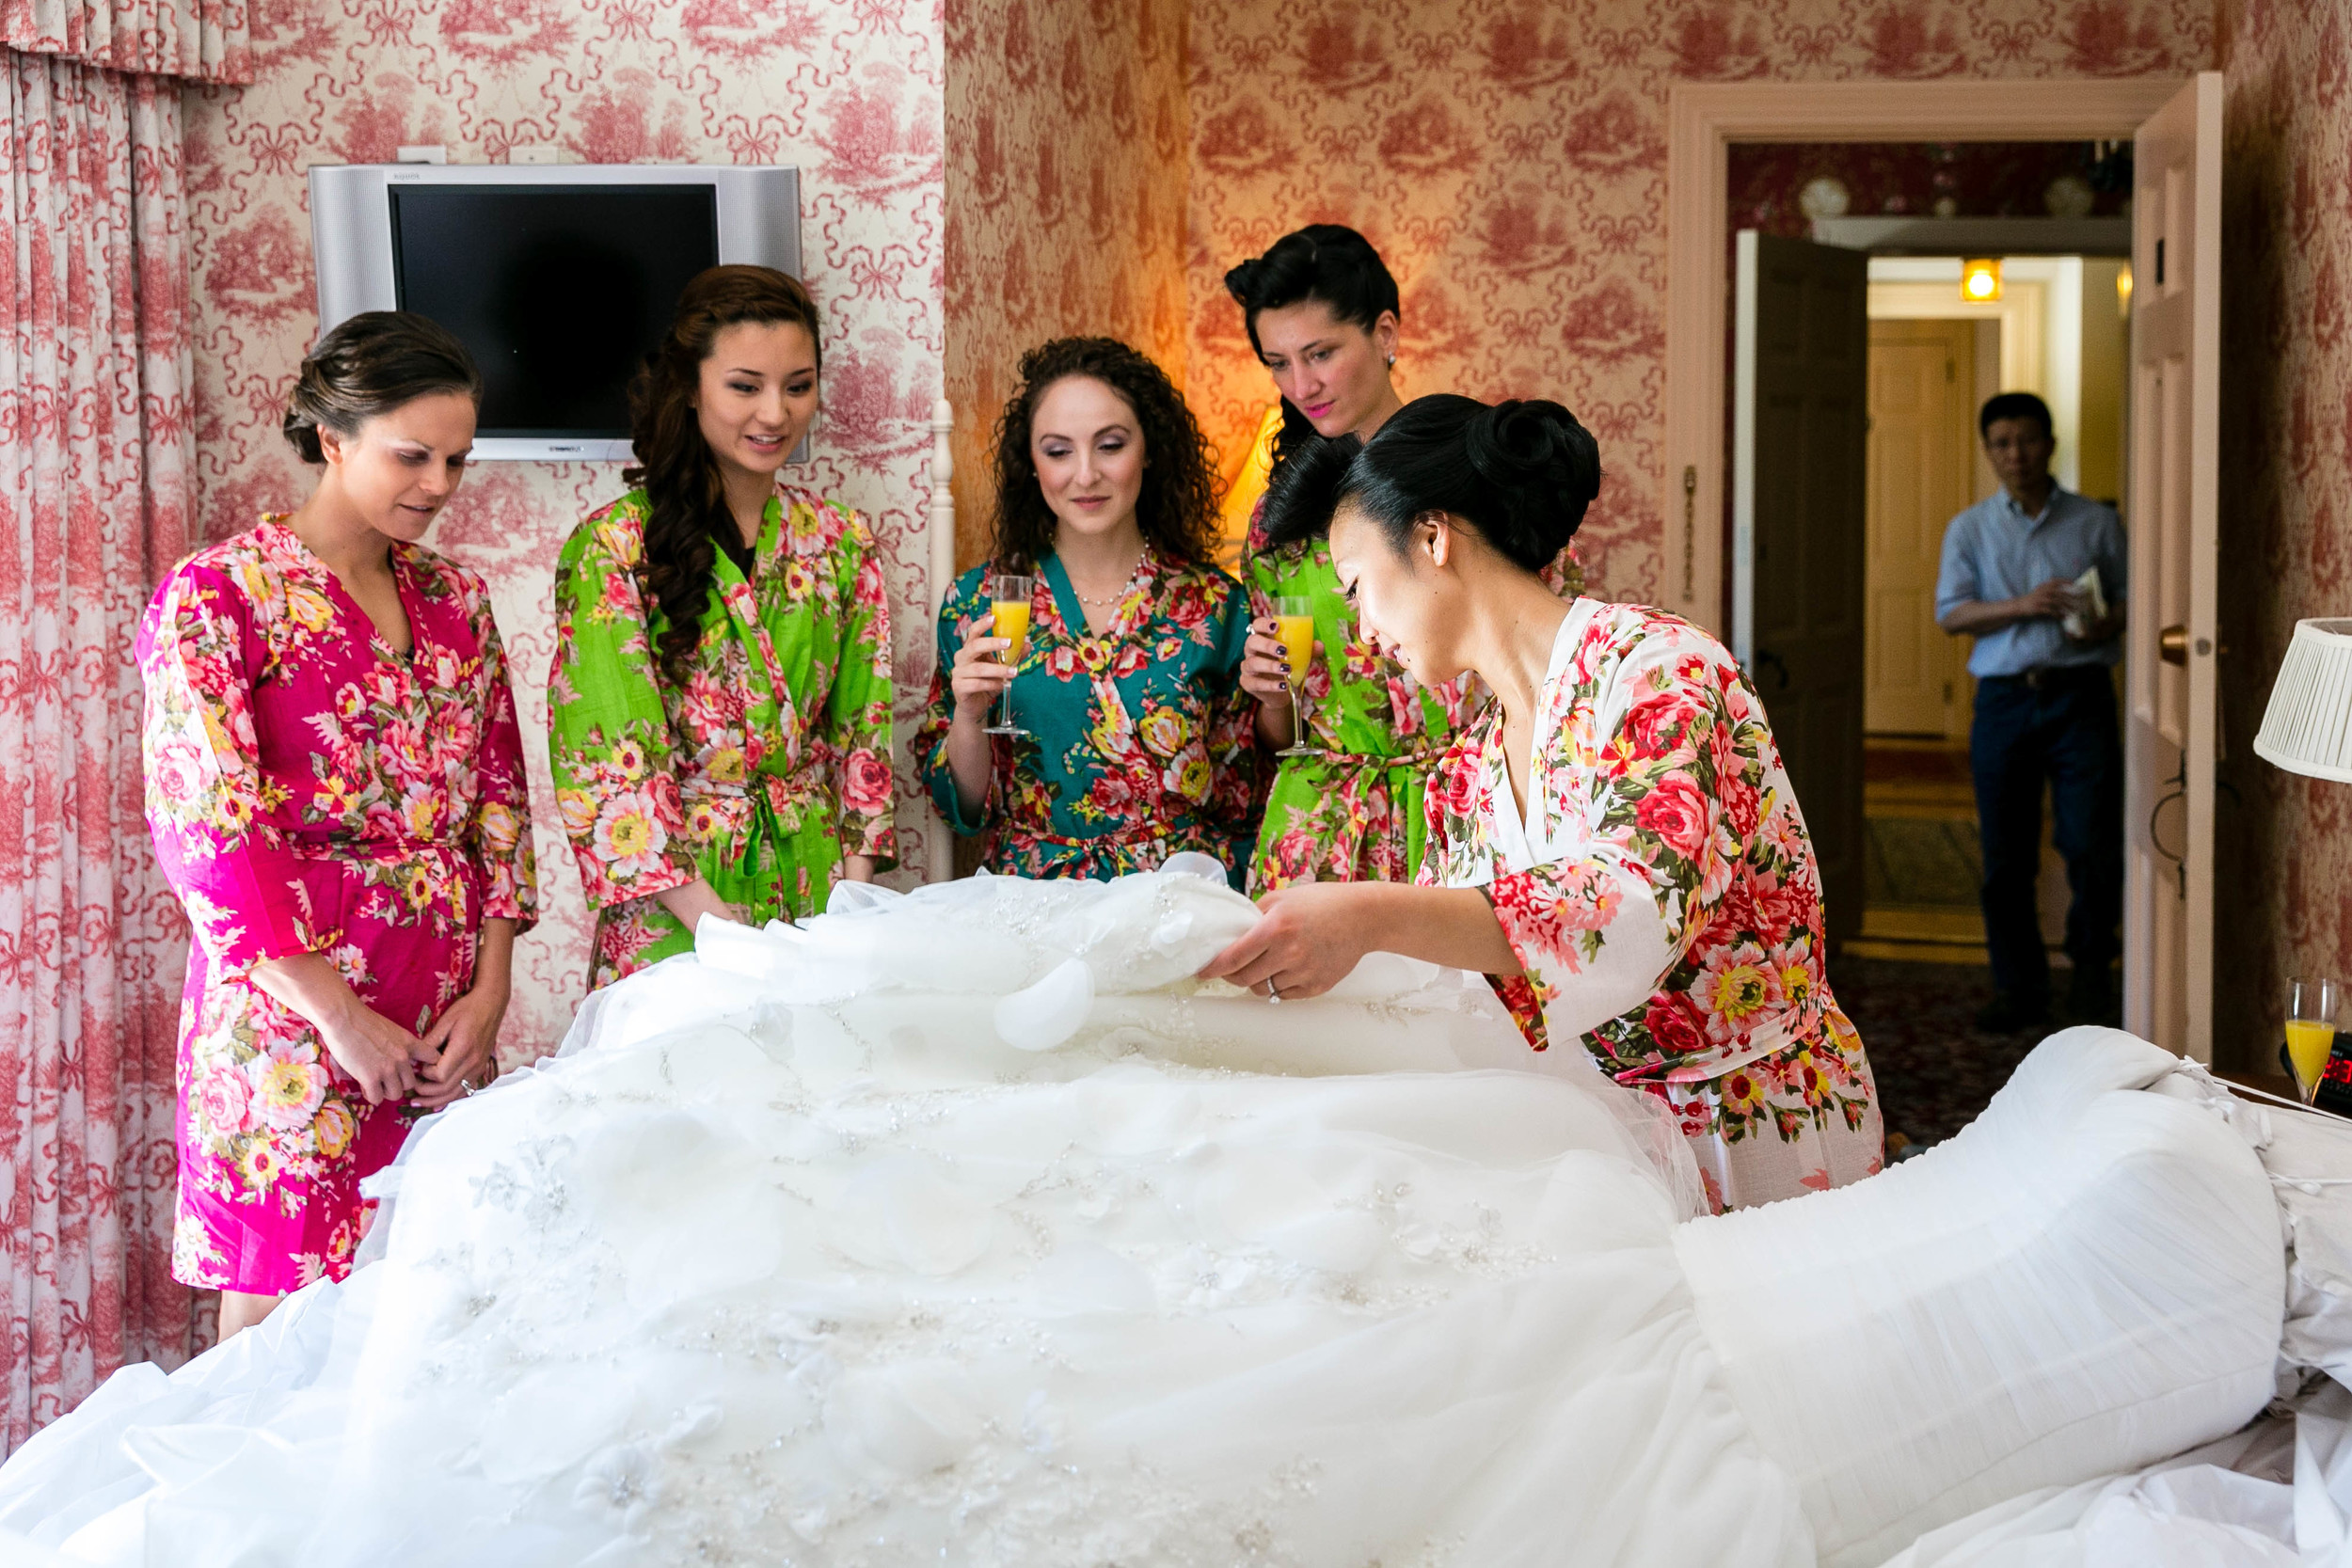 Luxurious-Chinese-Italian-Wedding-Pleasantdale-Chateau-West-Orange-New-Jersey-Photojournalisti-Wedding-Photography-Jacek-Dolata-2.jpg